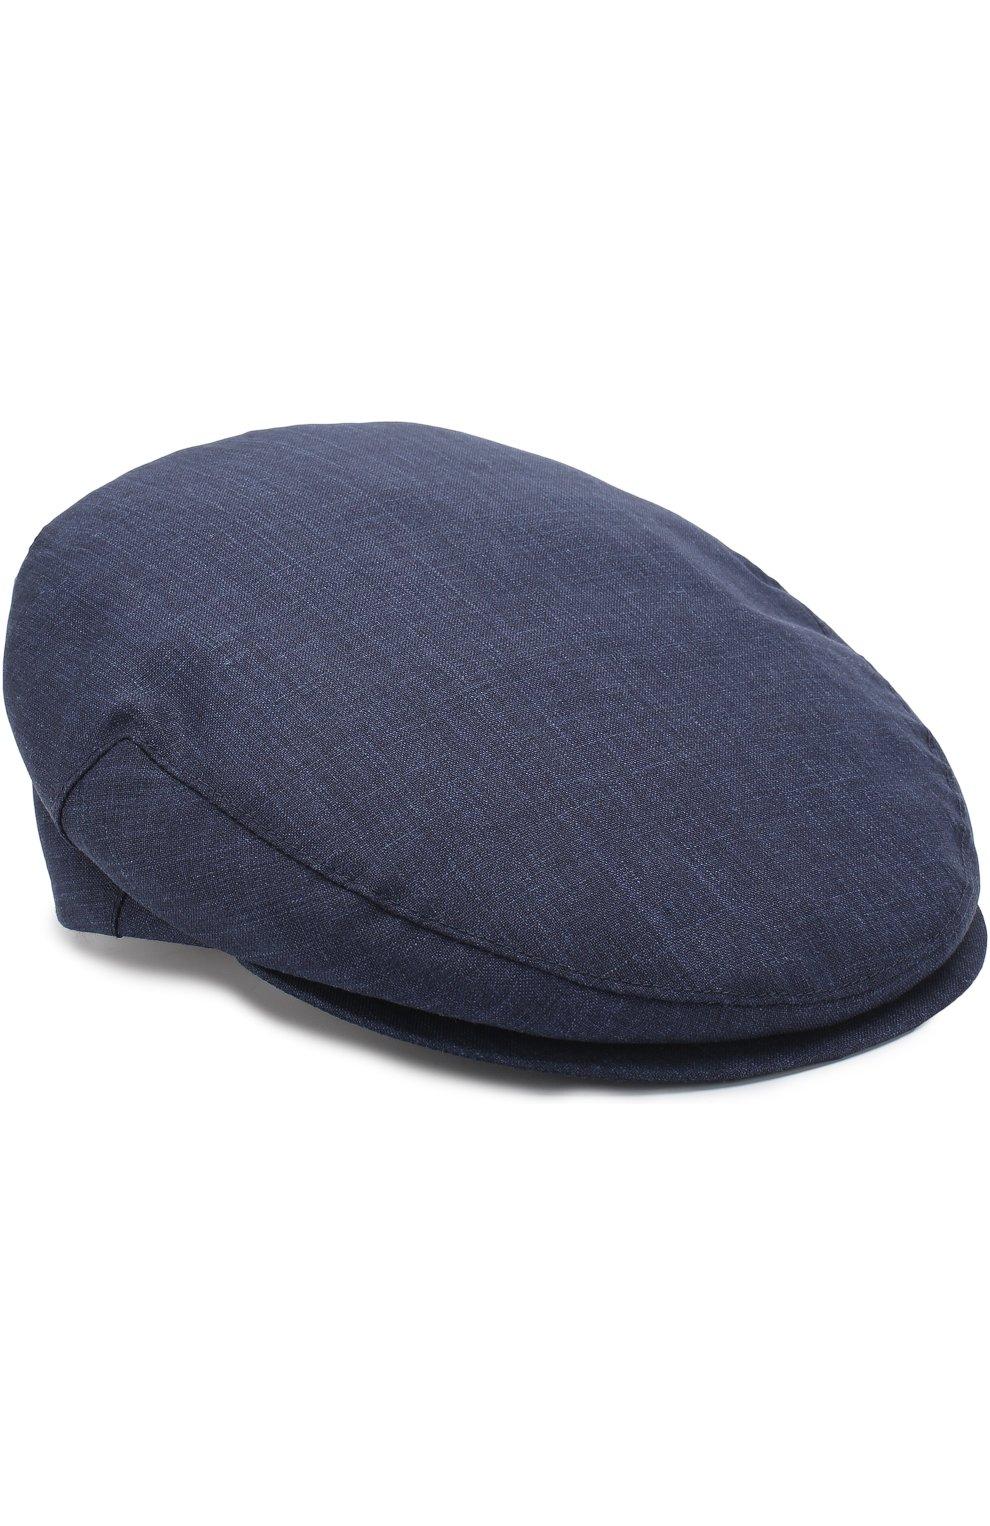 Мужская кепи из смеси шерсти и шелка со льном LUCIANO BARBERA темно-синего цвета, арт. 128001/46079 | Фото 1